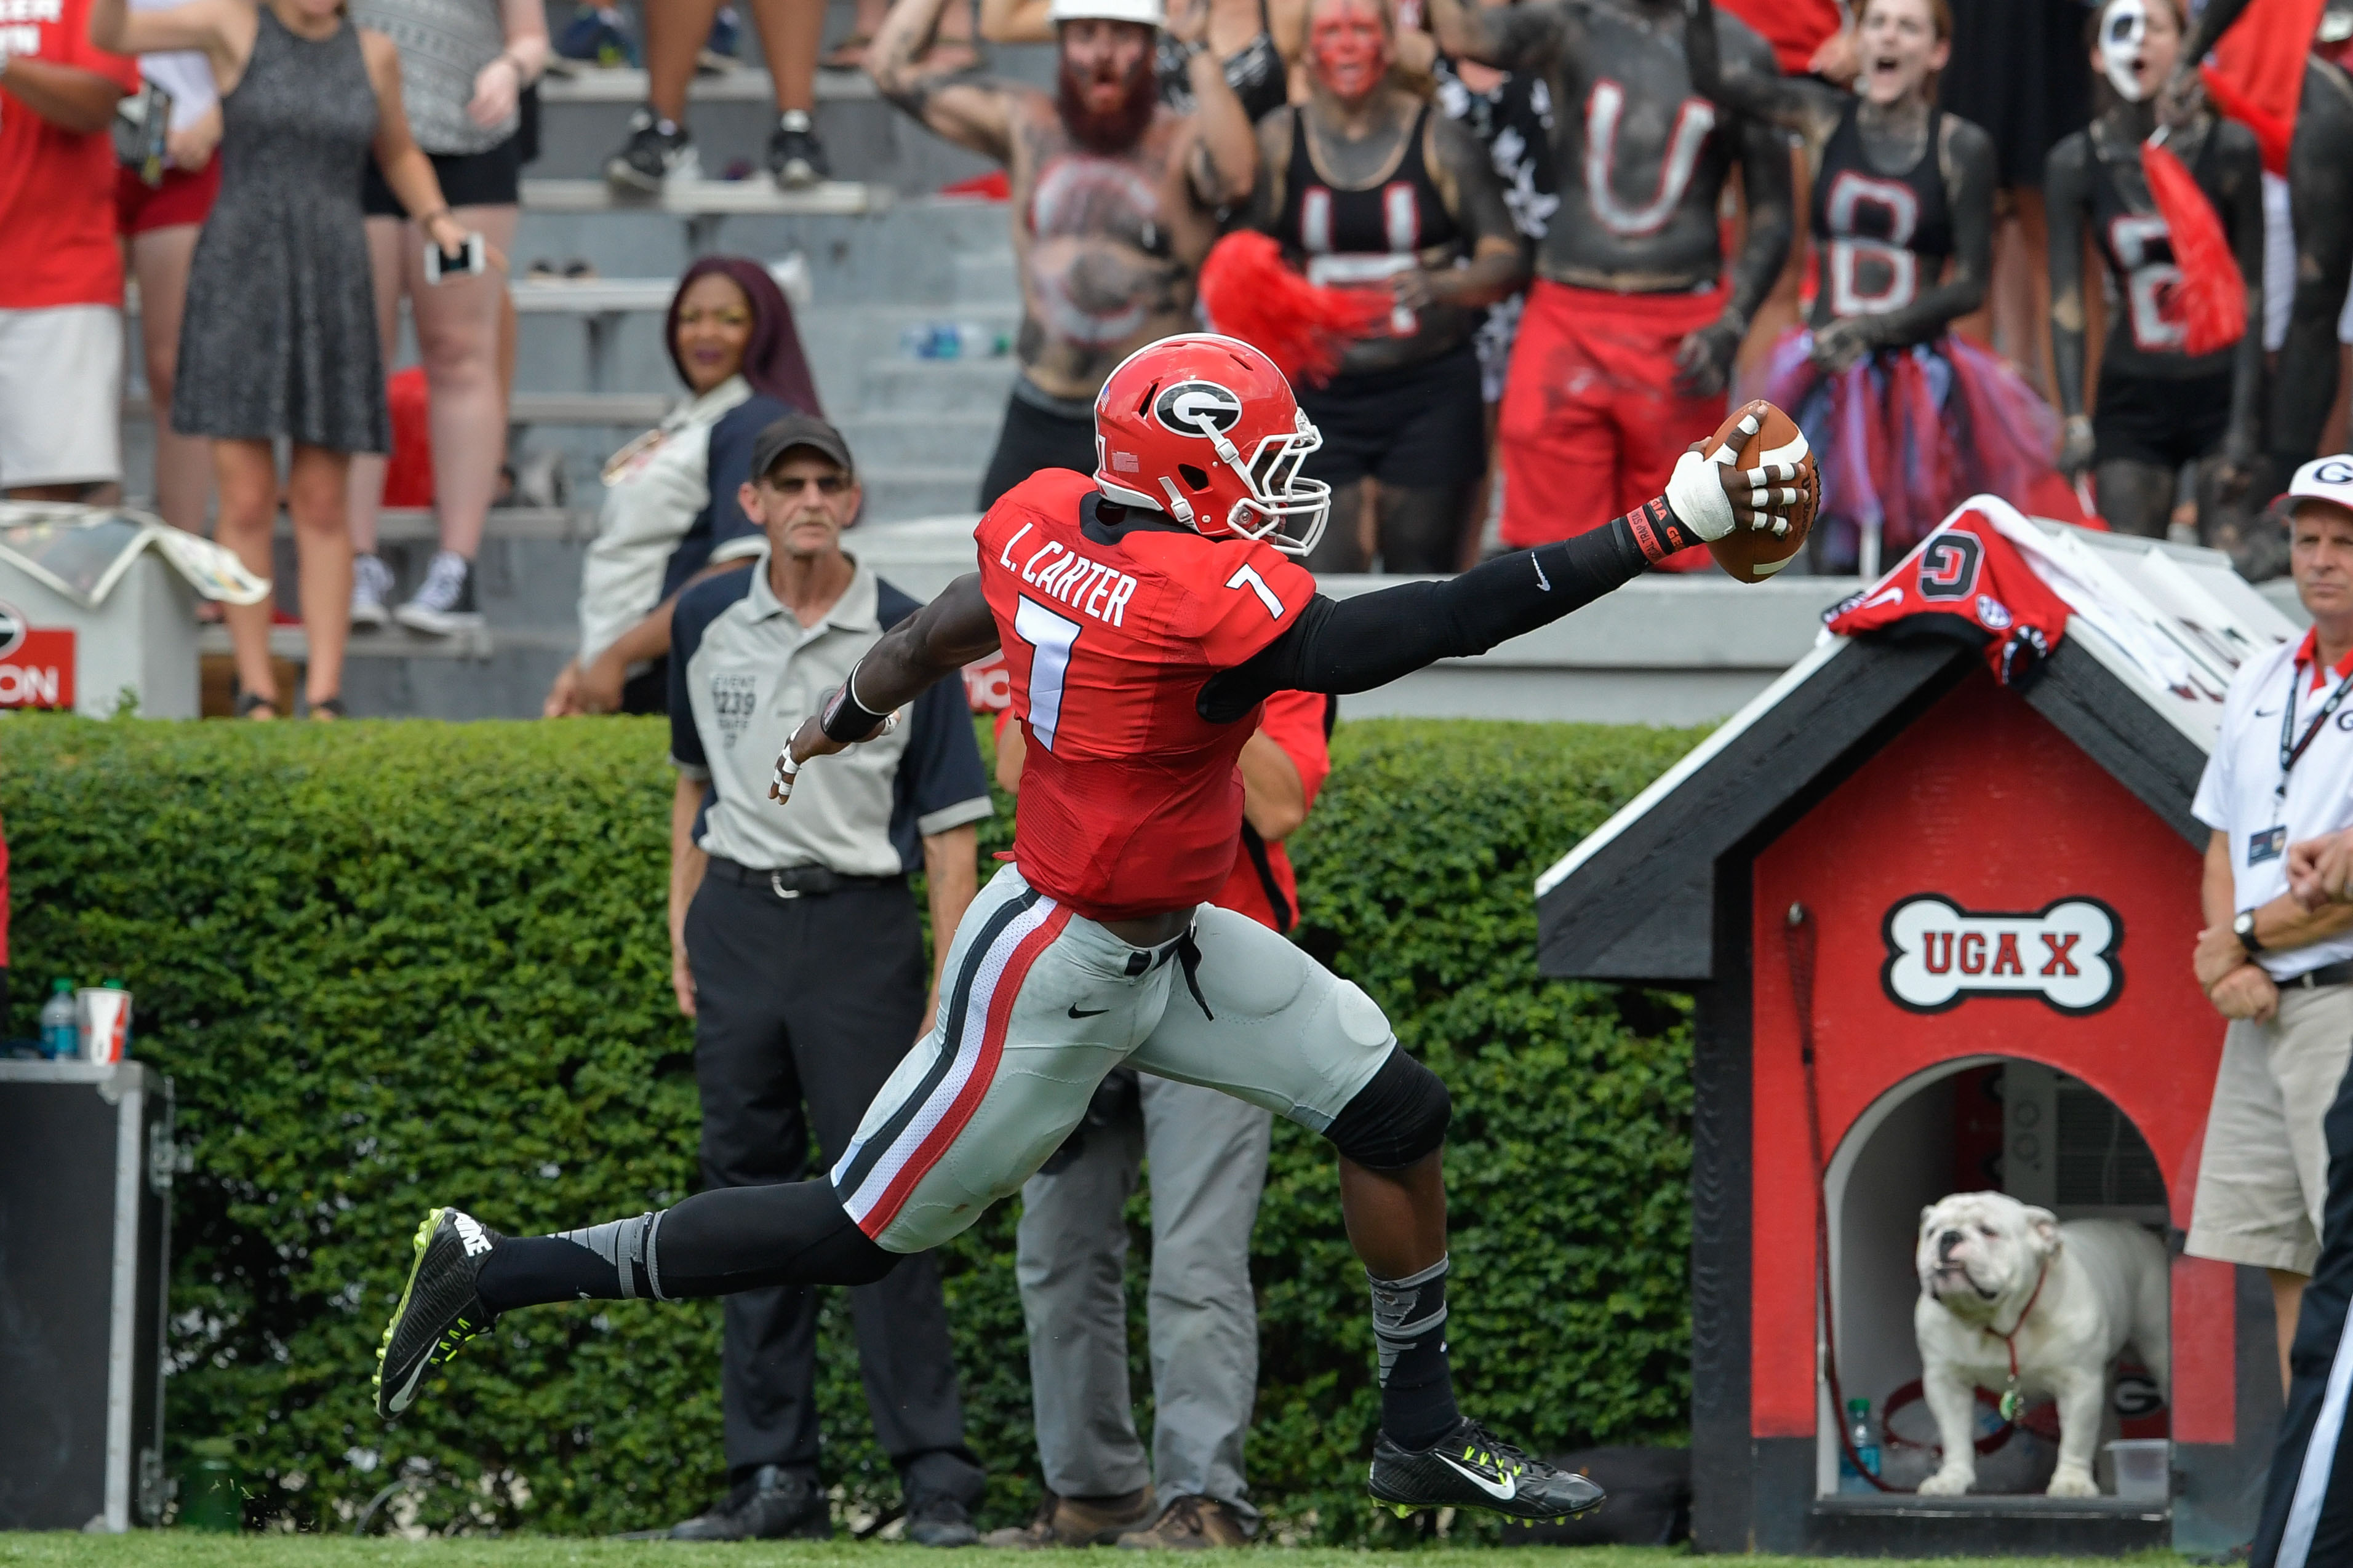 NCAA Football: Nicholls State at Georgia